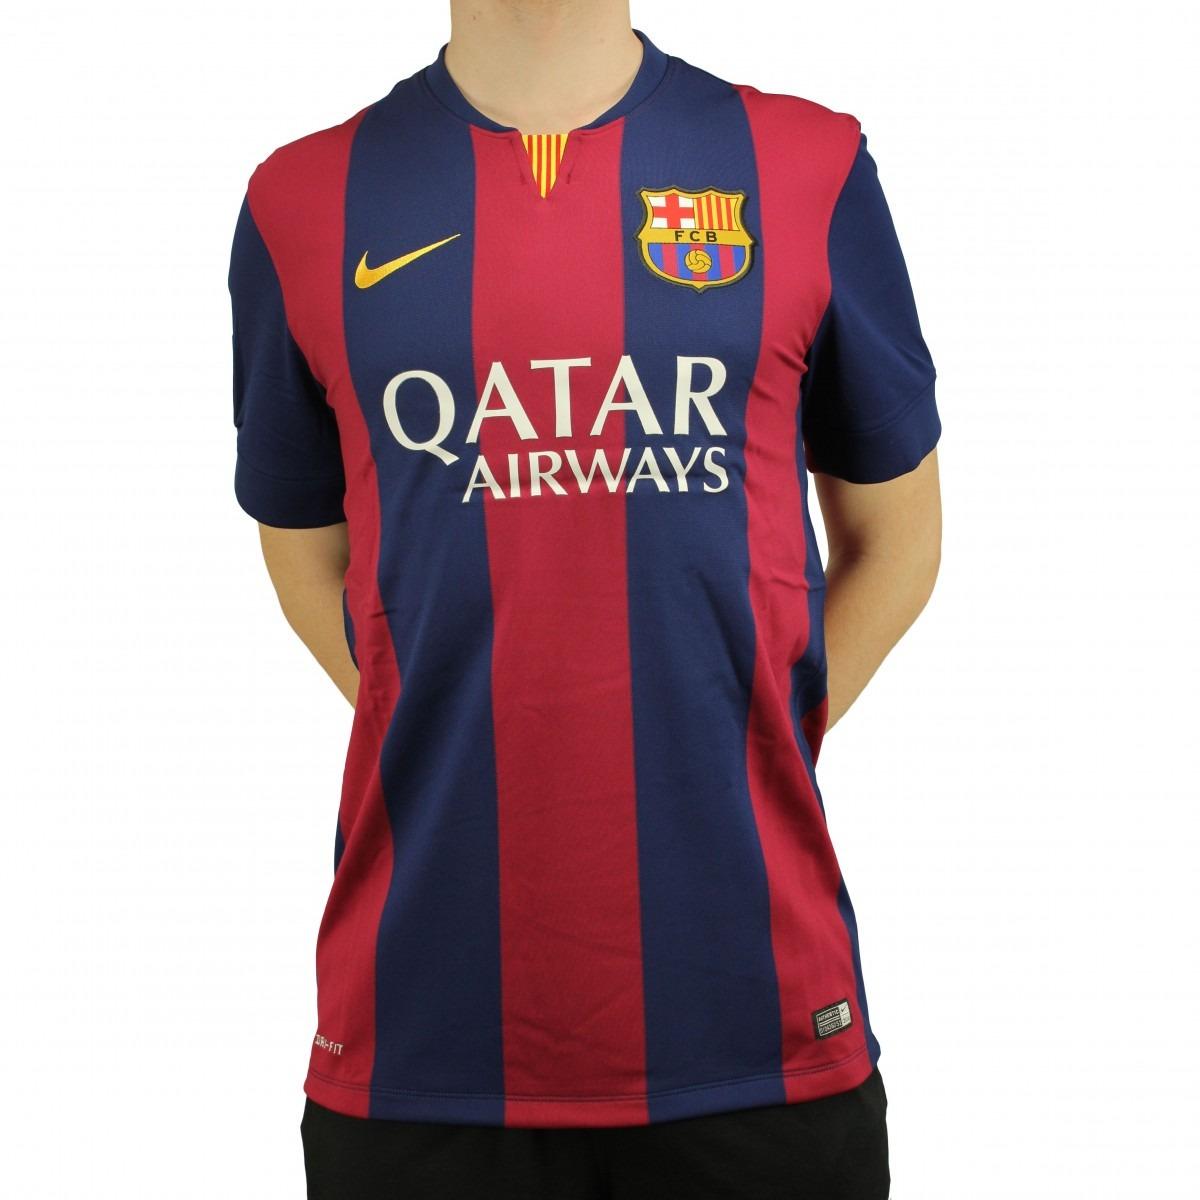 camisa nike barcelona home 2014 - loja freecs -. Carregando zoom. f0a5ce428f195